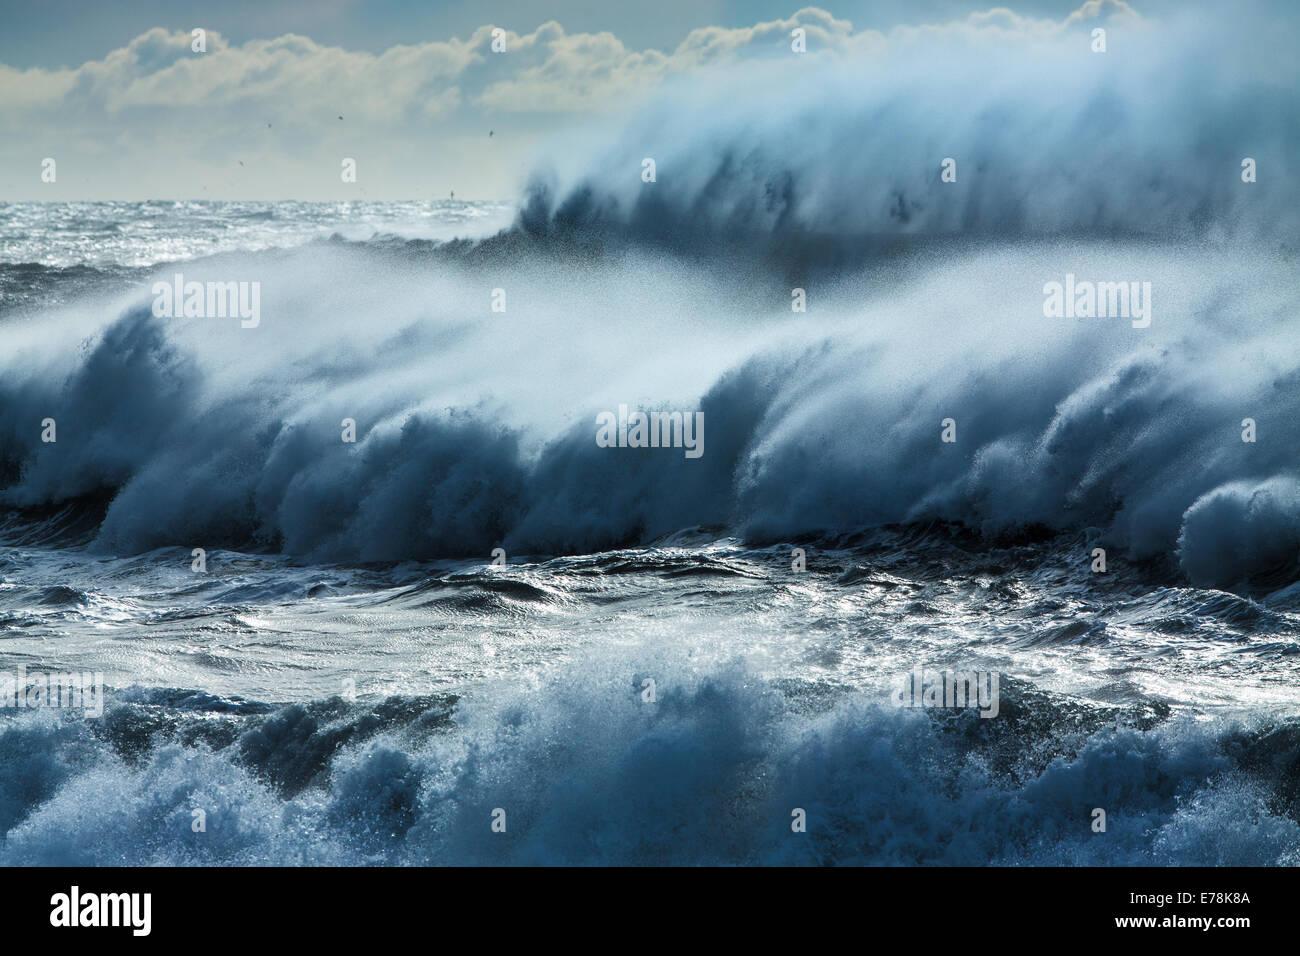 waves breaking on Renisfjara beach, southern Iceland - Stock Image